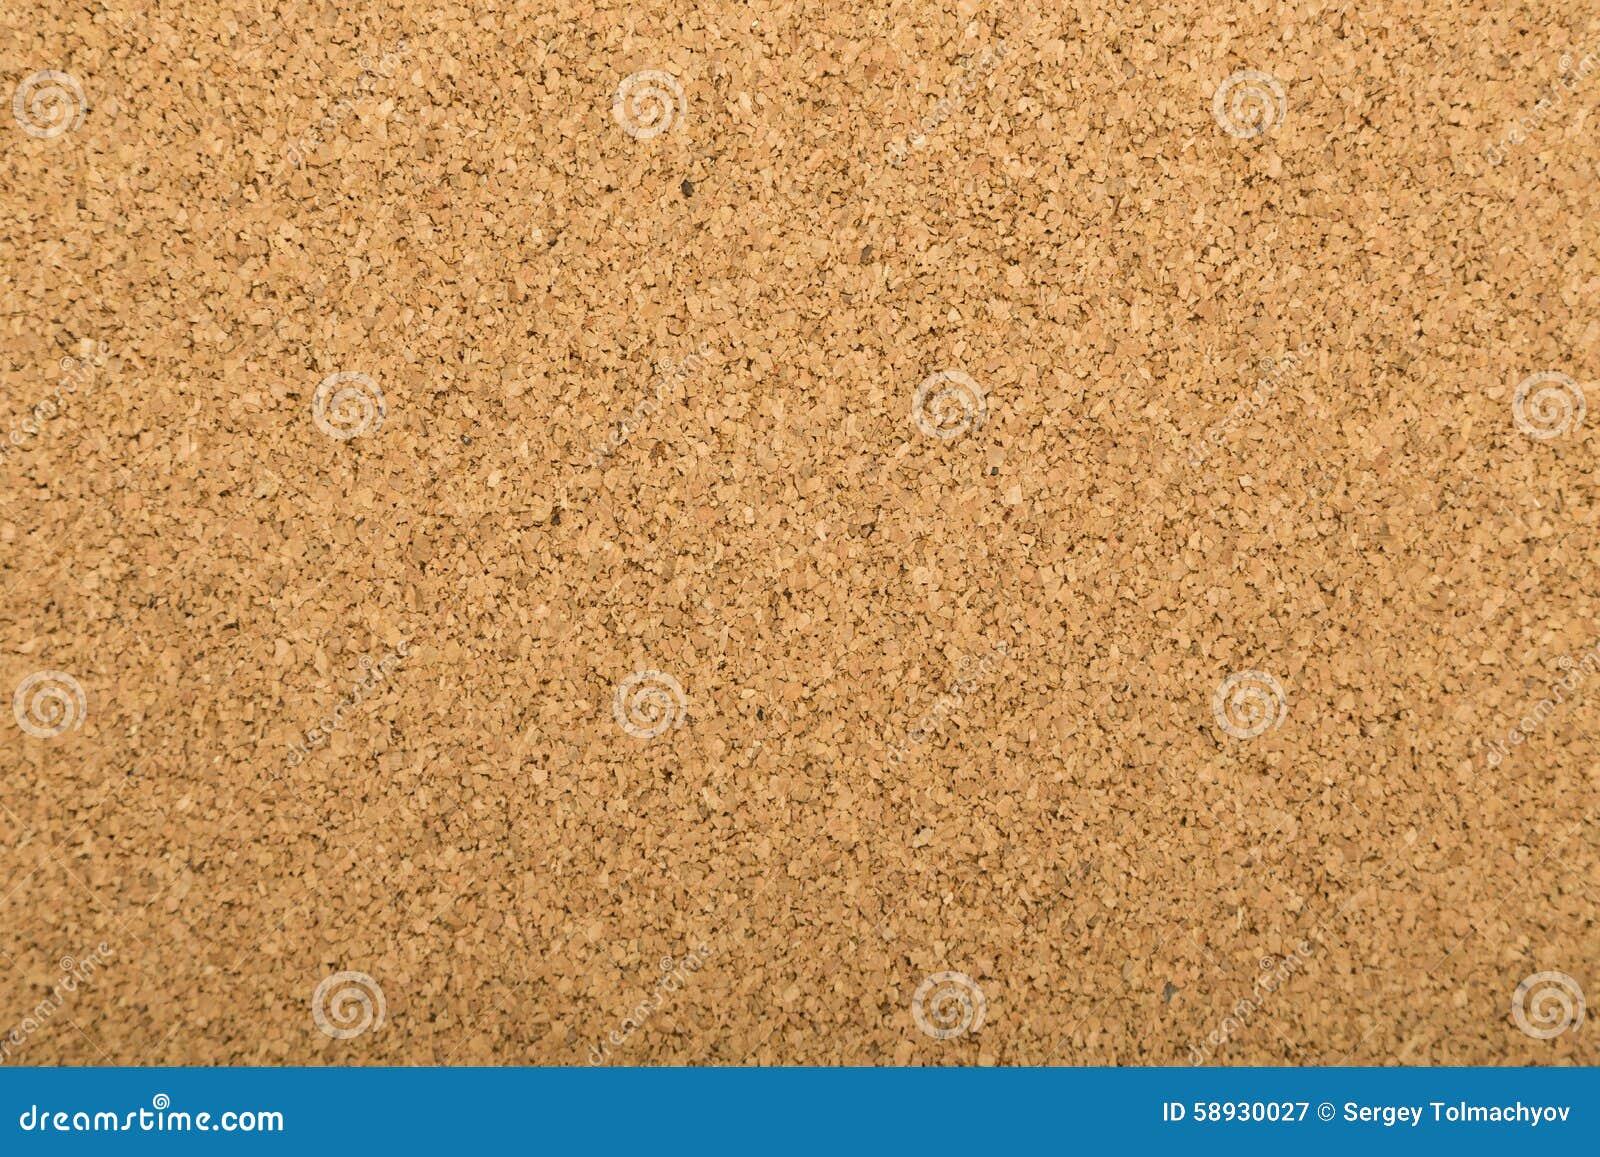 Download Cork board background stock image. Image of blank, corkboard - 58930027